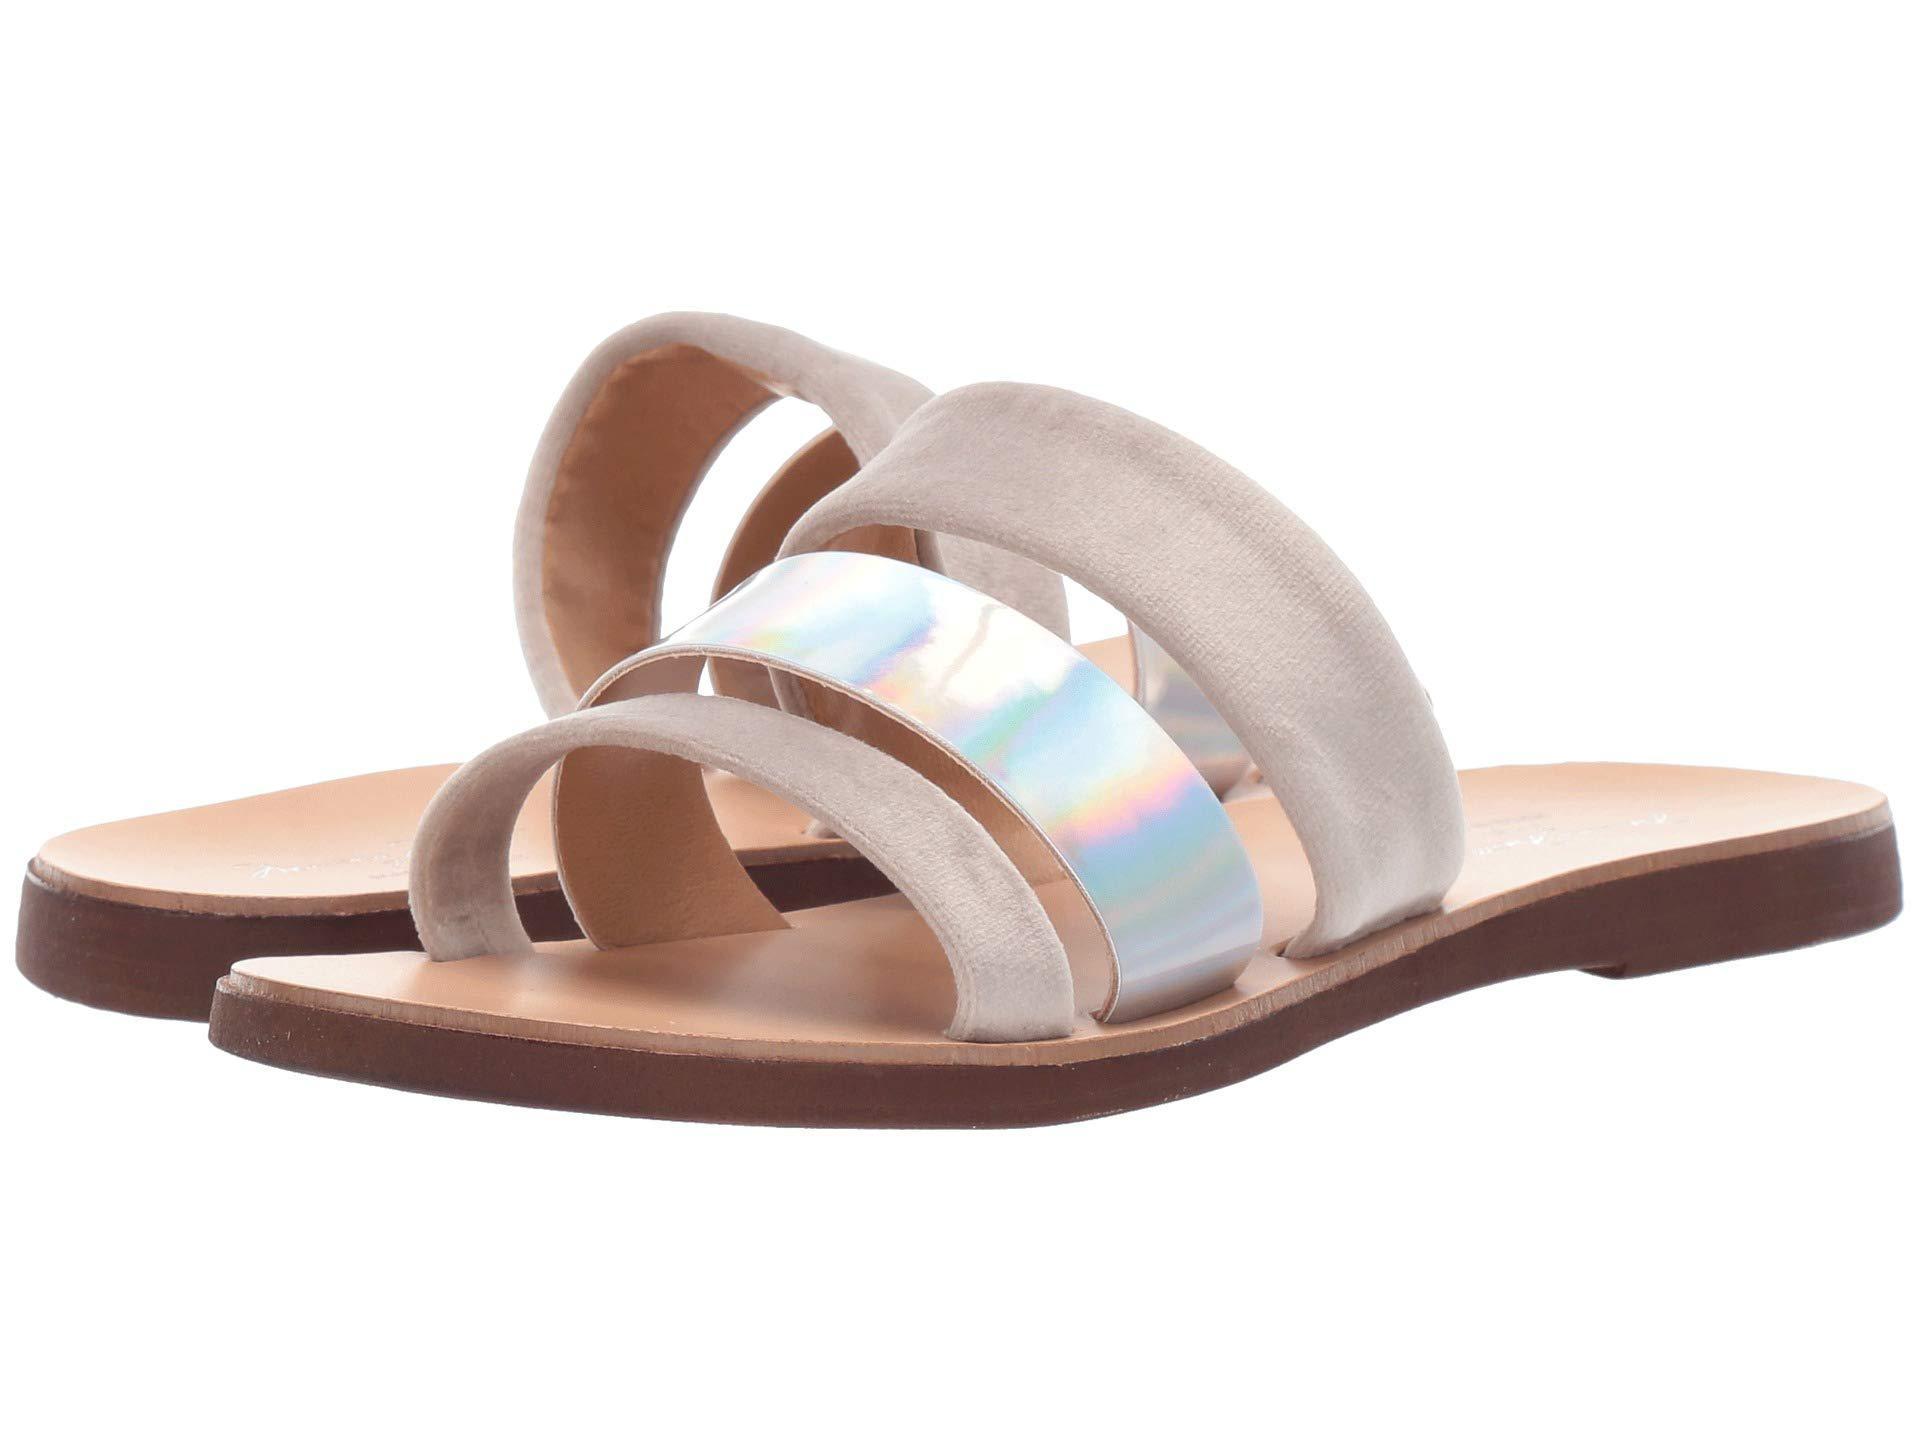 28a8f3e6f062 Lyst - Massimo Matteo 3 Band Sandal 19 (gris) Women s Sandals